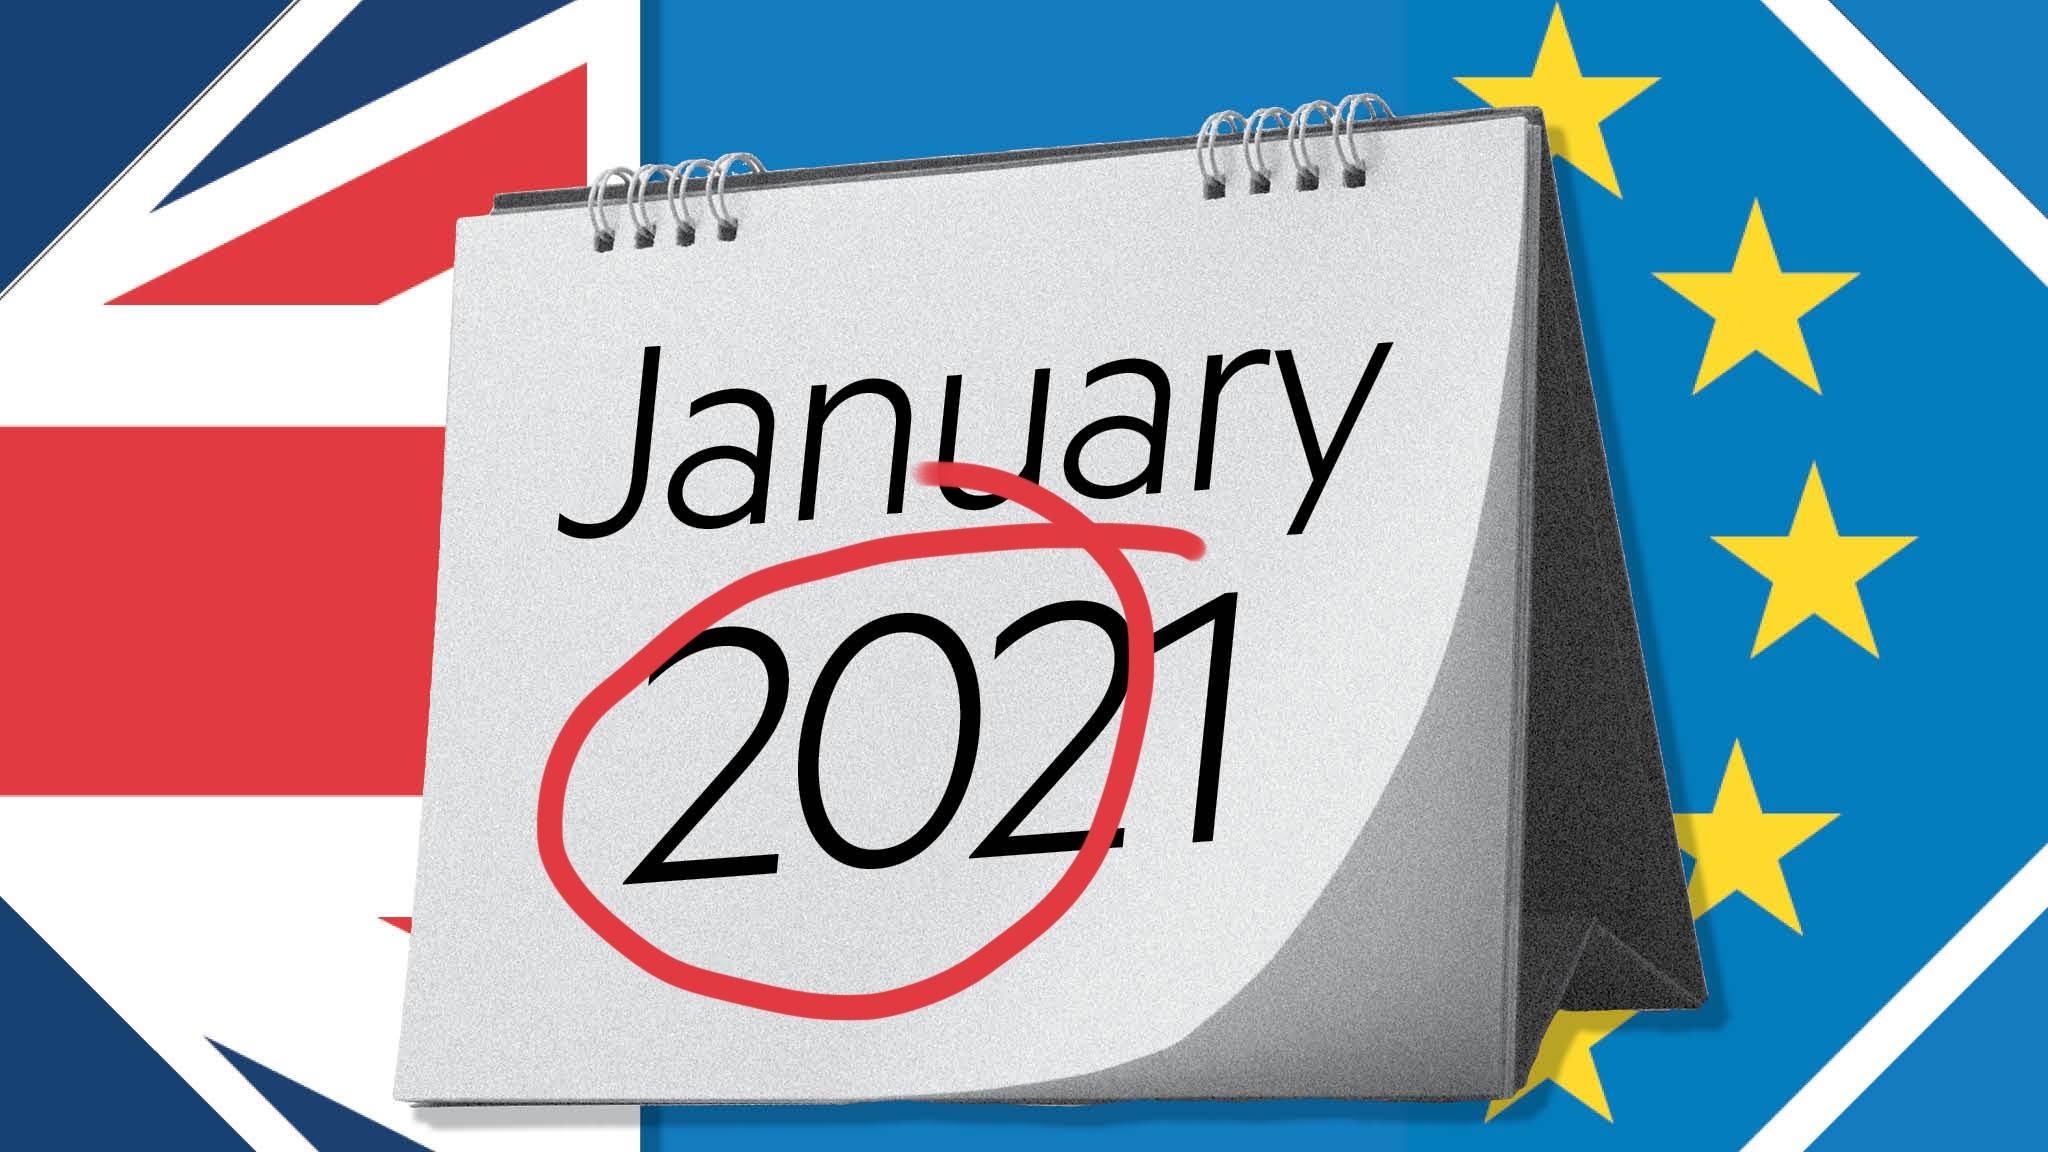 Brussels raises prospect of longer Brexit transition